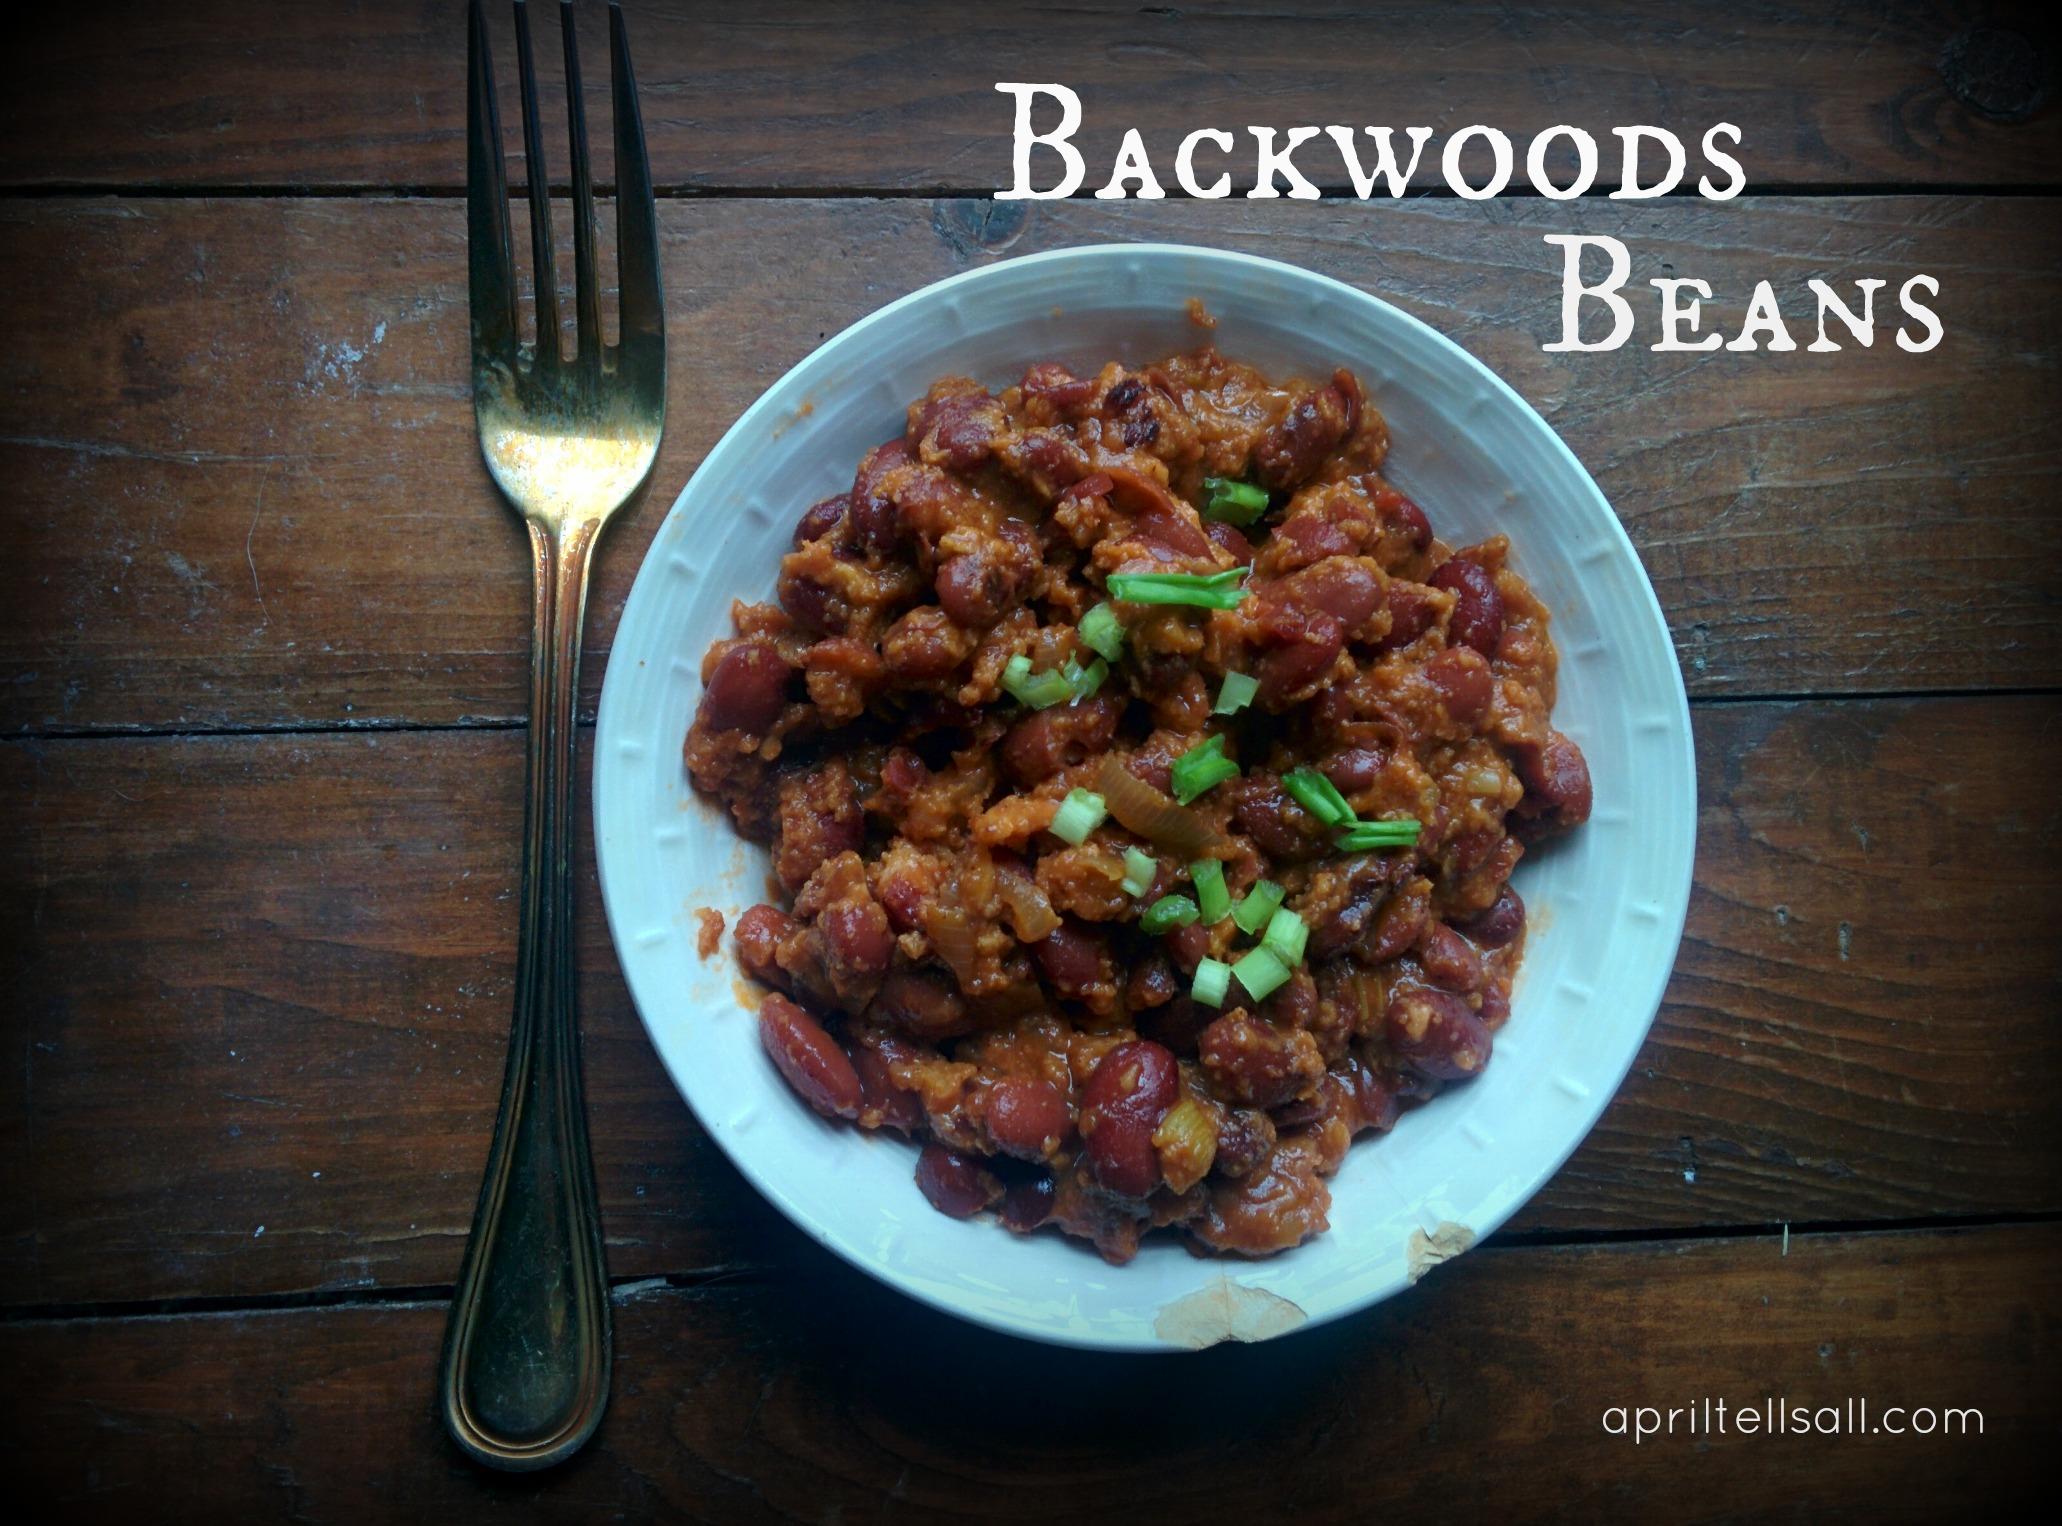 Backwoods Beans April Tells All